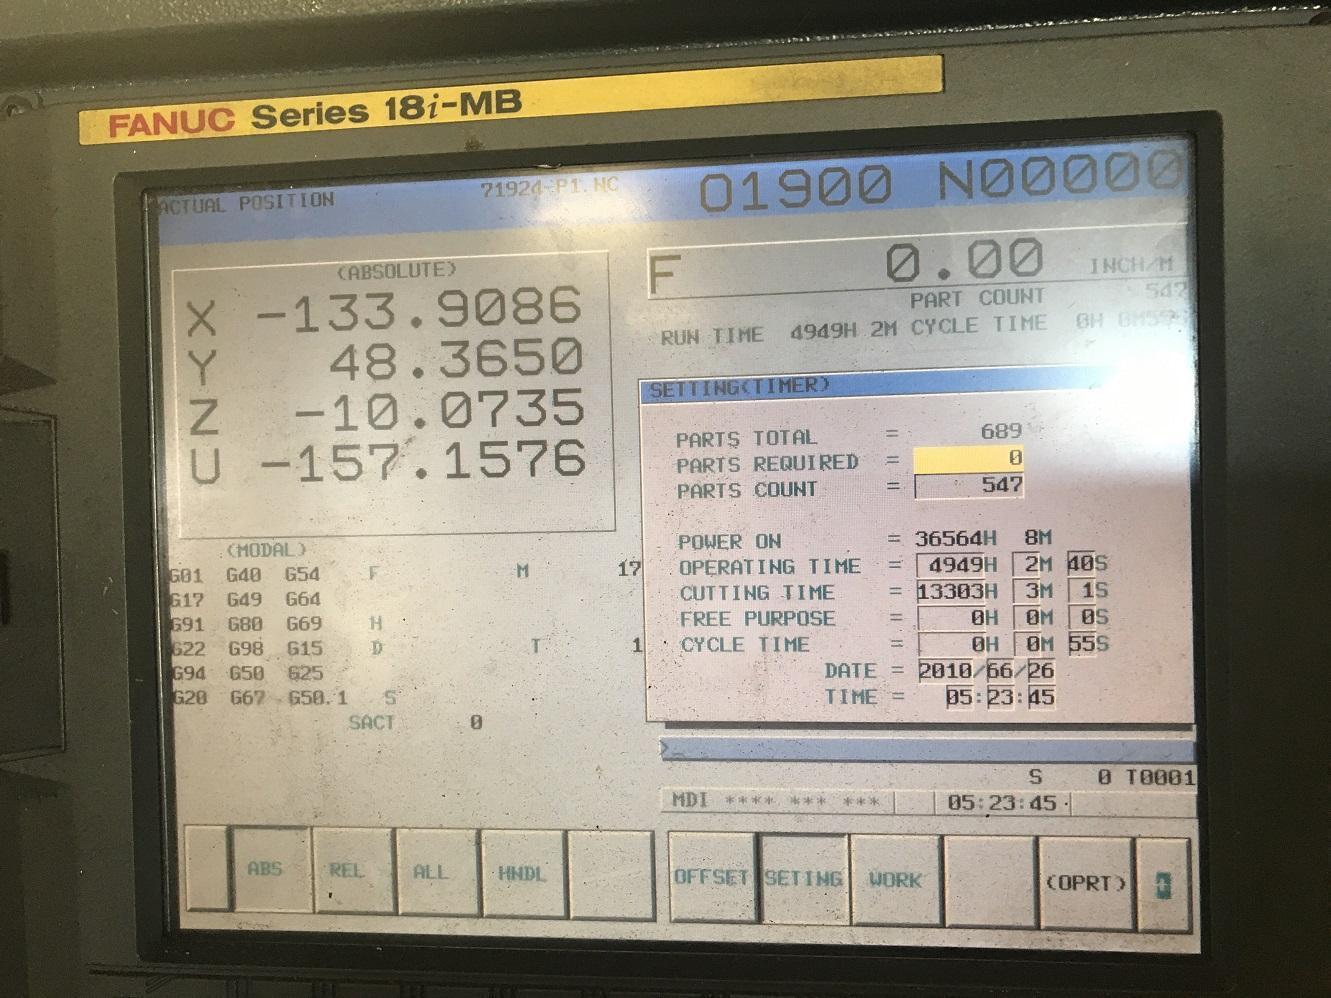 9b07dfa300c023243e5a63a75574b644-d7bb0c13975c2b4b061d3d66c59d611b.jpeg